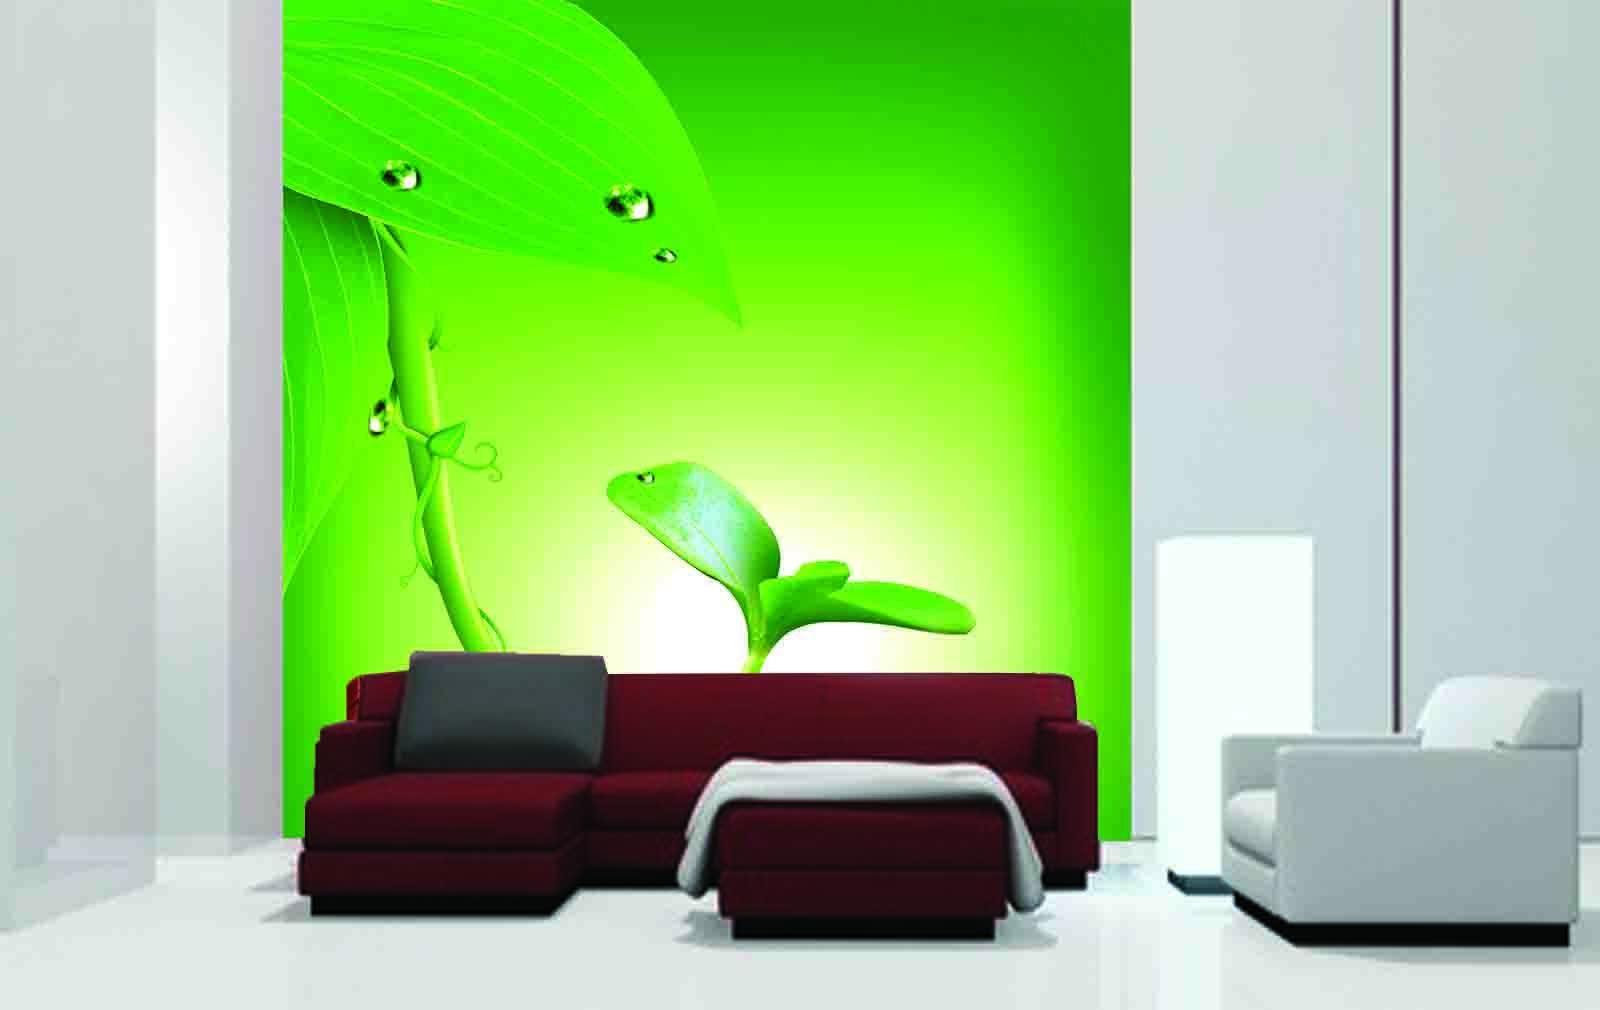 3D Natürliche Natürliche Natürliche Knospen 895 Tapete Wandgemälde Tapeten Bild Familie DE Lemon | Gemäßigten Kosten  | Guter Markt  |  6ce9da